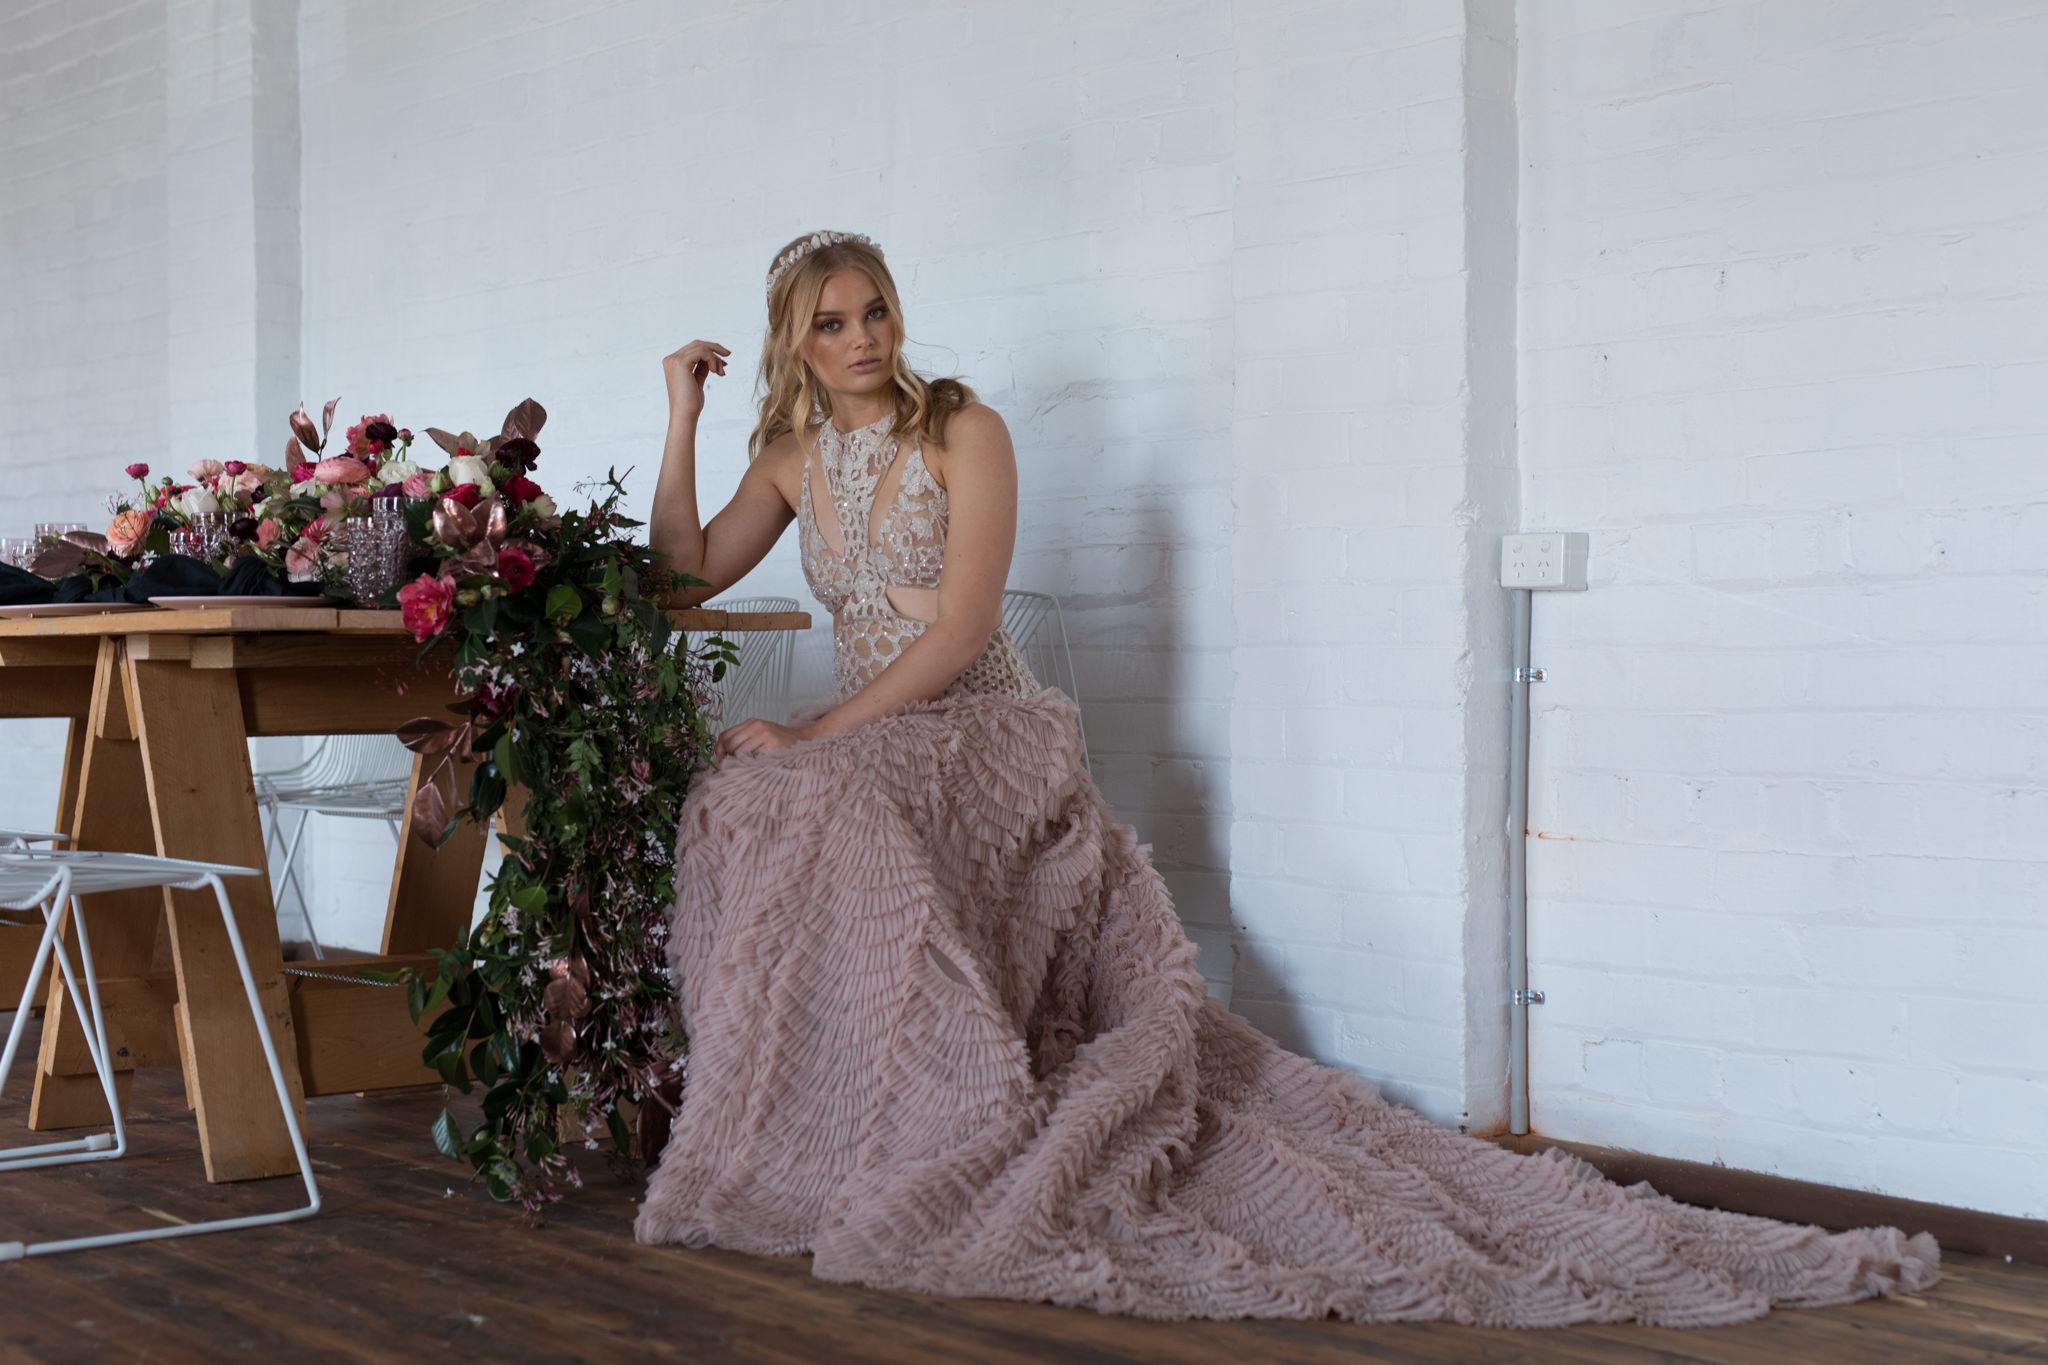 Adobe Lightrom and photoshop portrait and wedding presets by Sunshine Coast Photographer